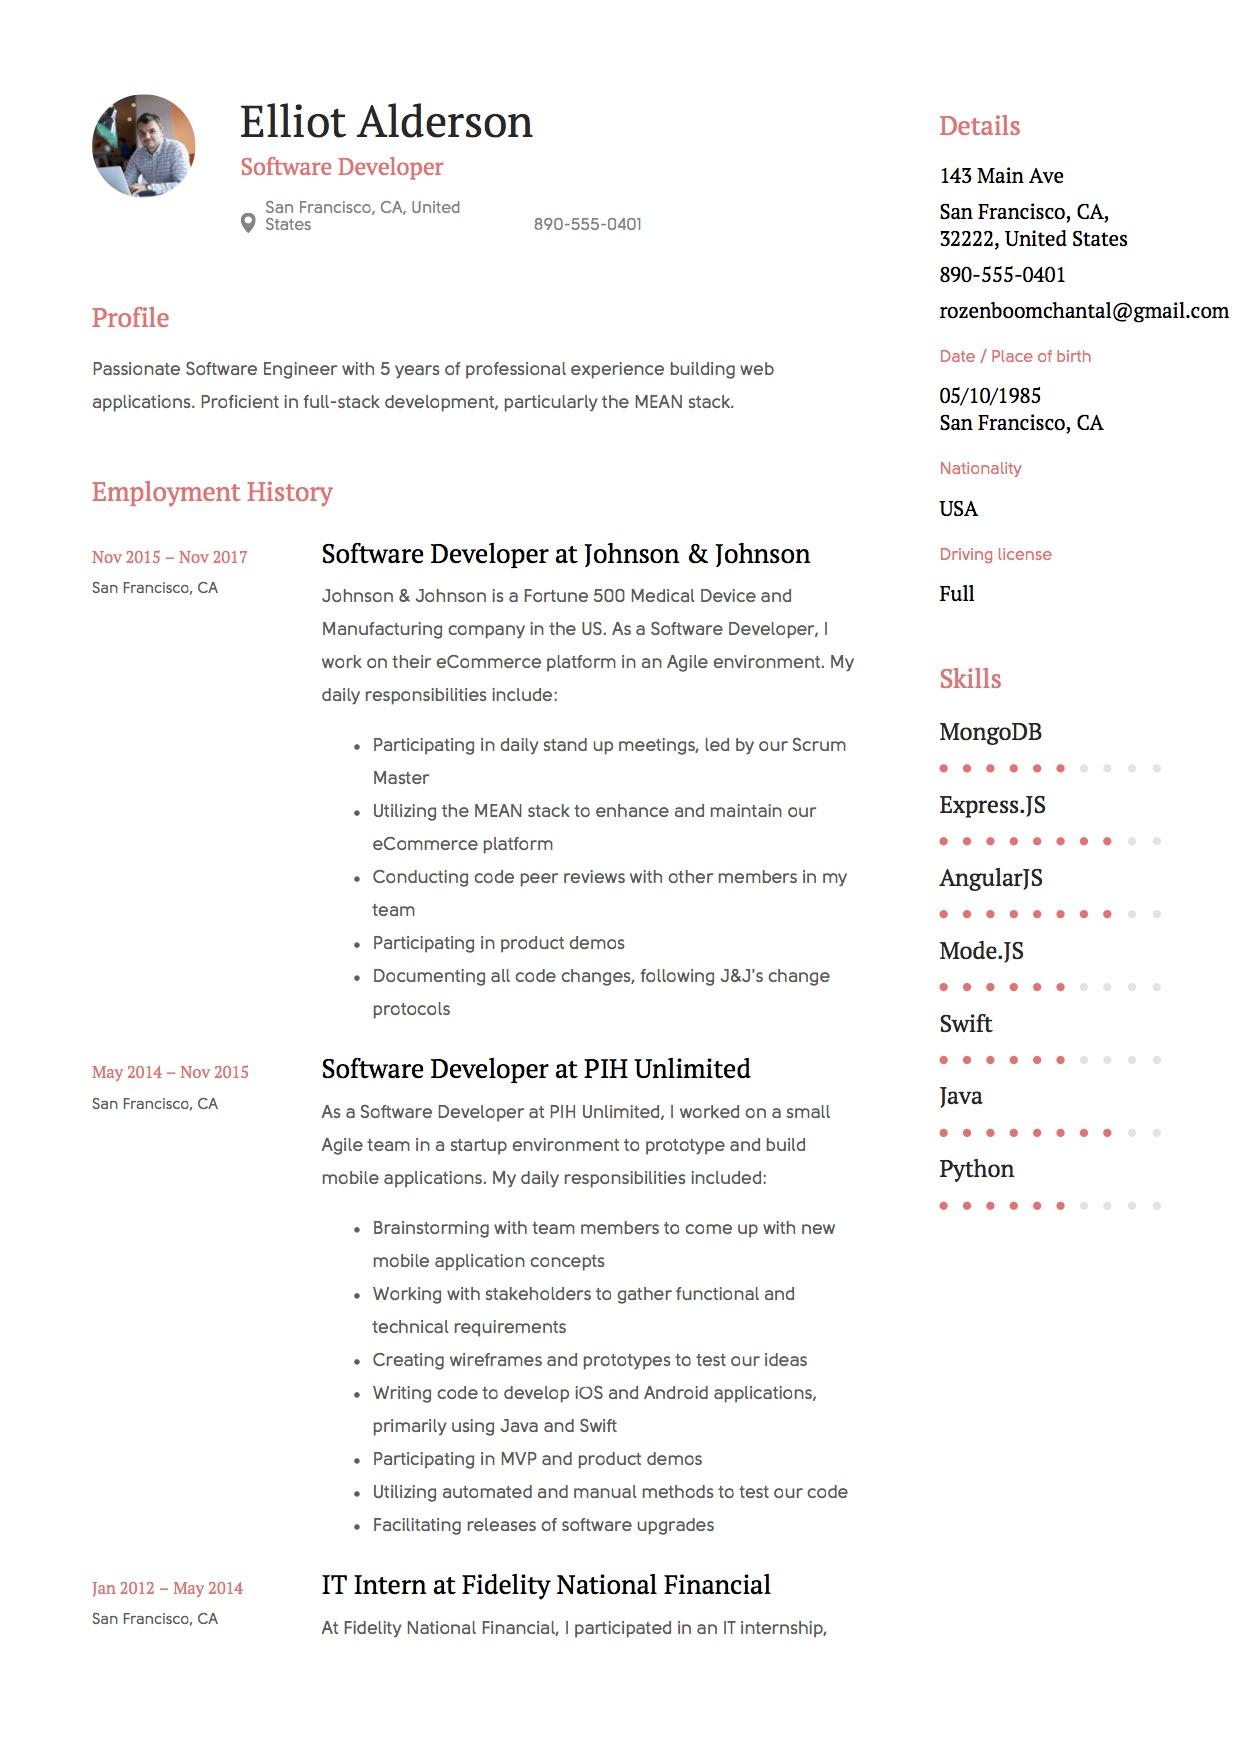 resume profile software developer